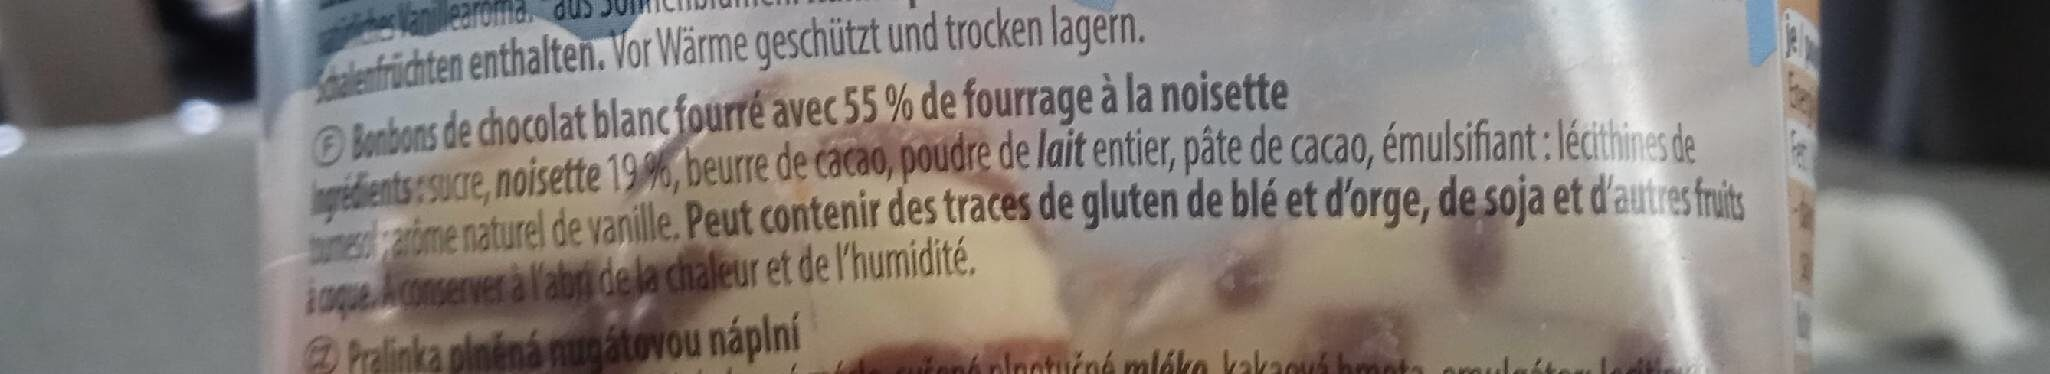 Chocolat belge - Prodotto - fr